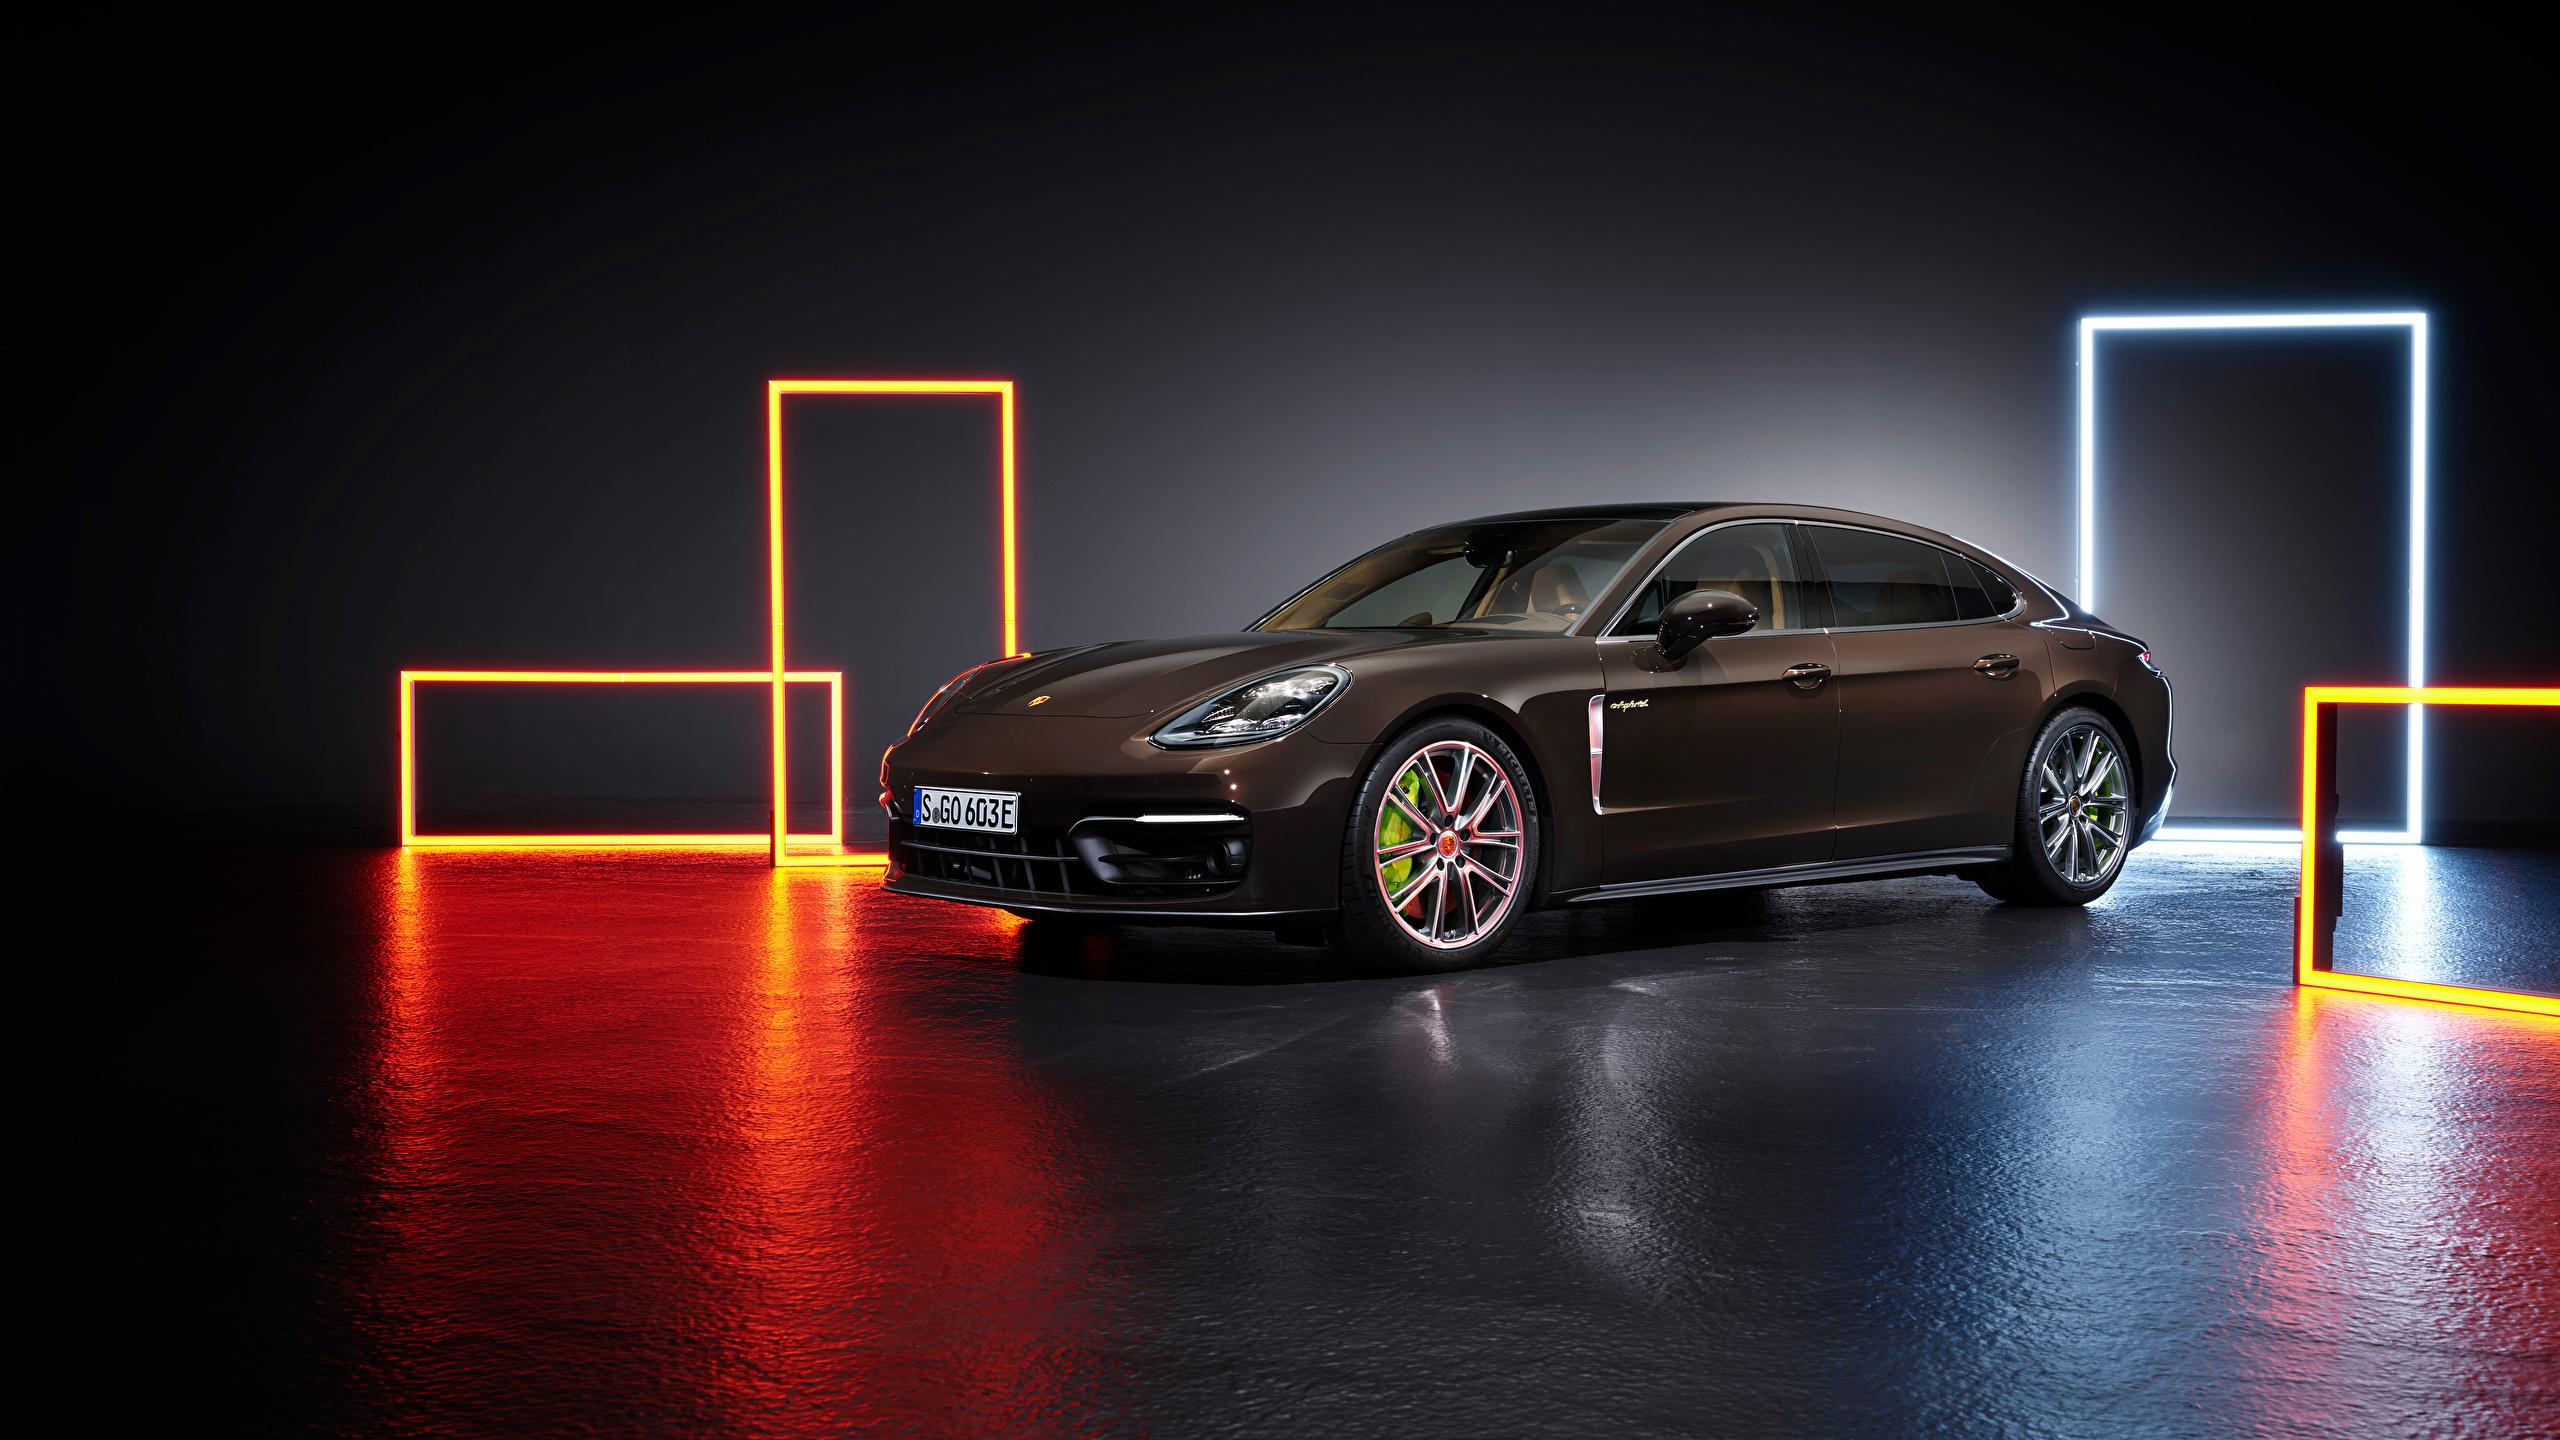 Фото Порше anamera 4S E-Hybrid Executive, (971), 2020 коричневые Сбоку Металлик Автомобили 2560x1440 Porsche Коричневый коричневая авто машины машина автомобиль